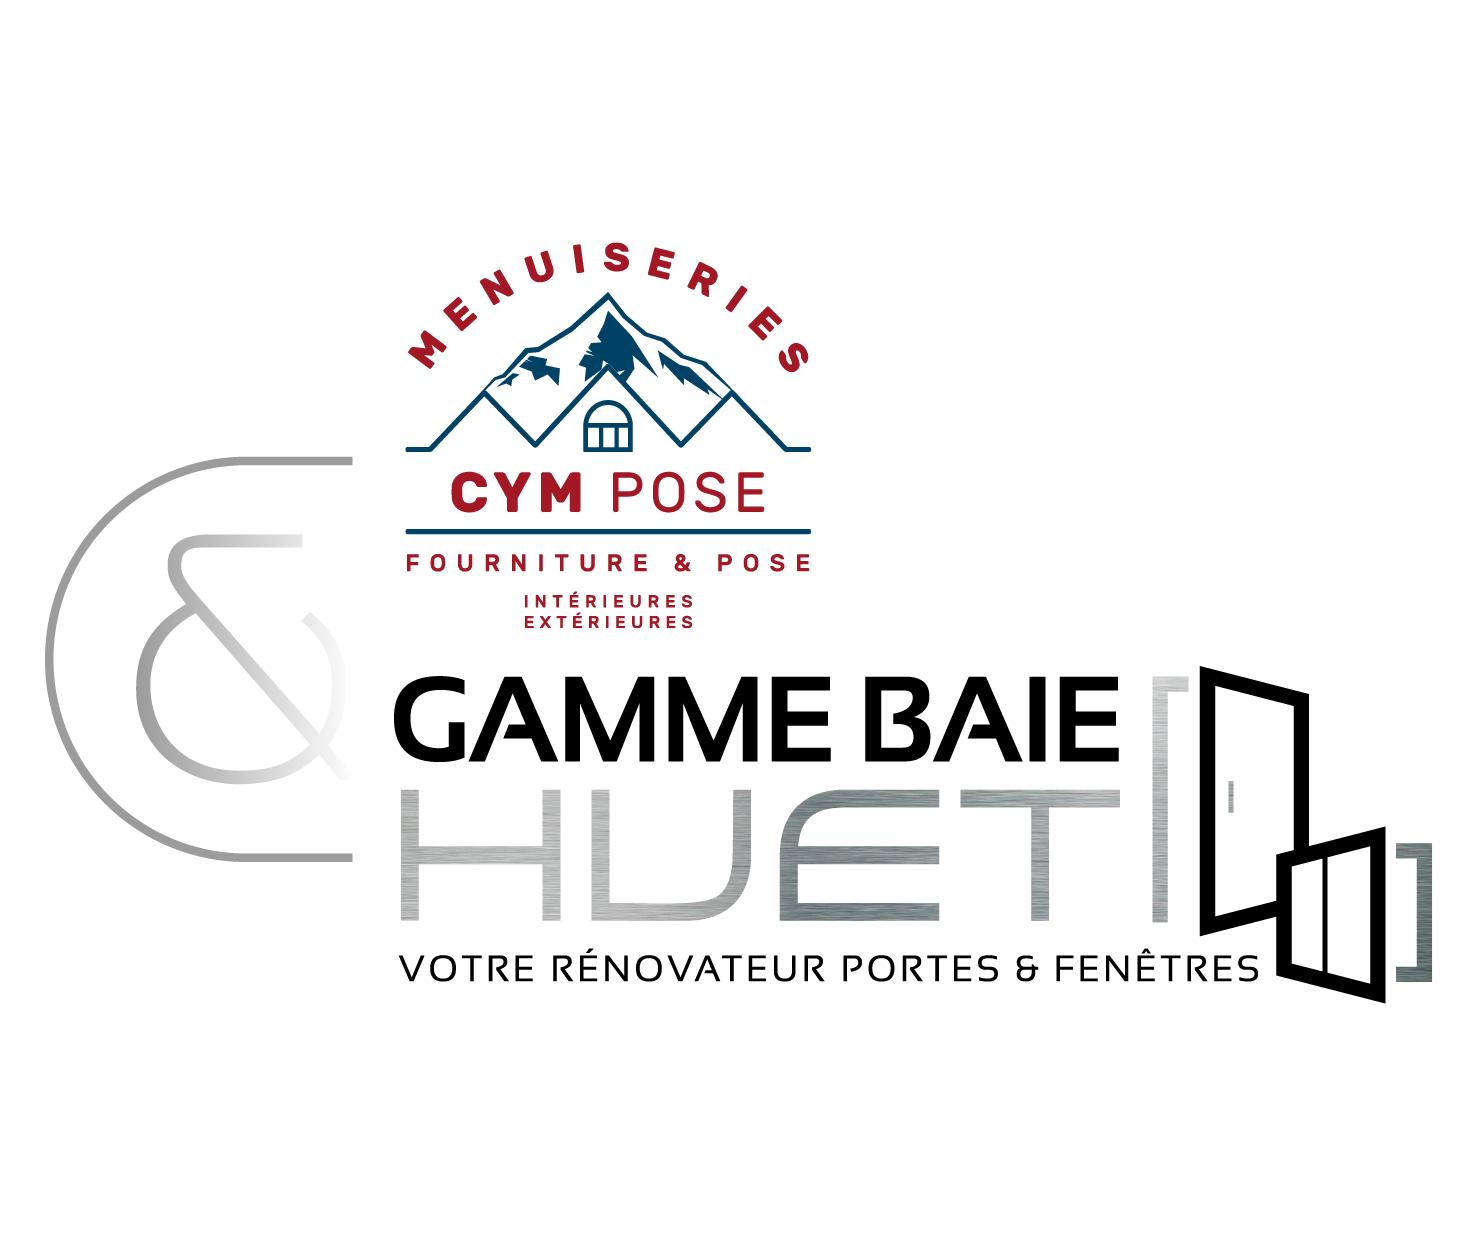 Logo Cym Pose Gamme Baie-Huet